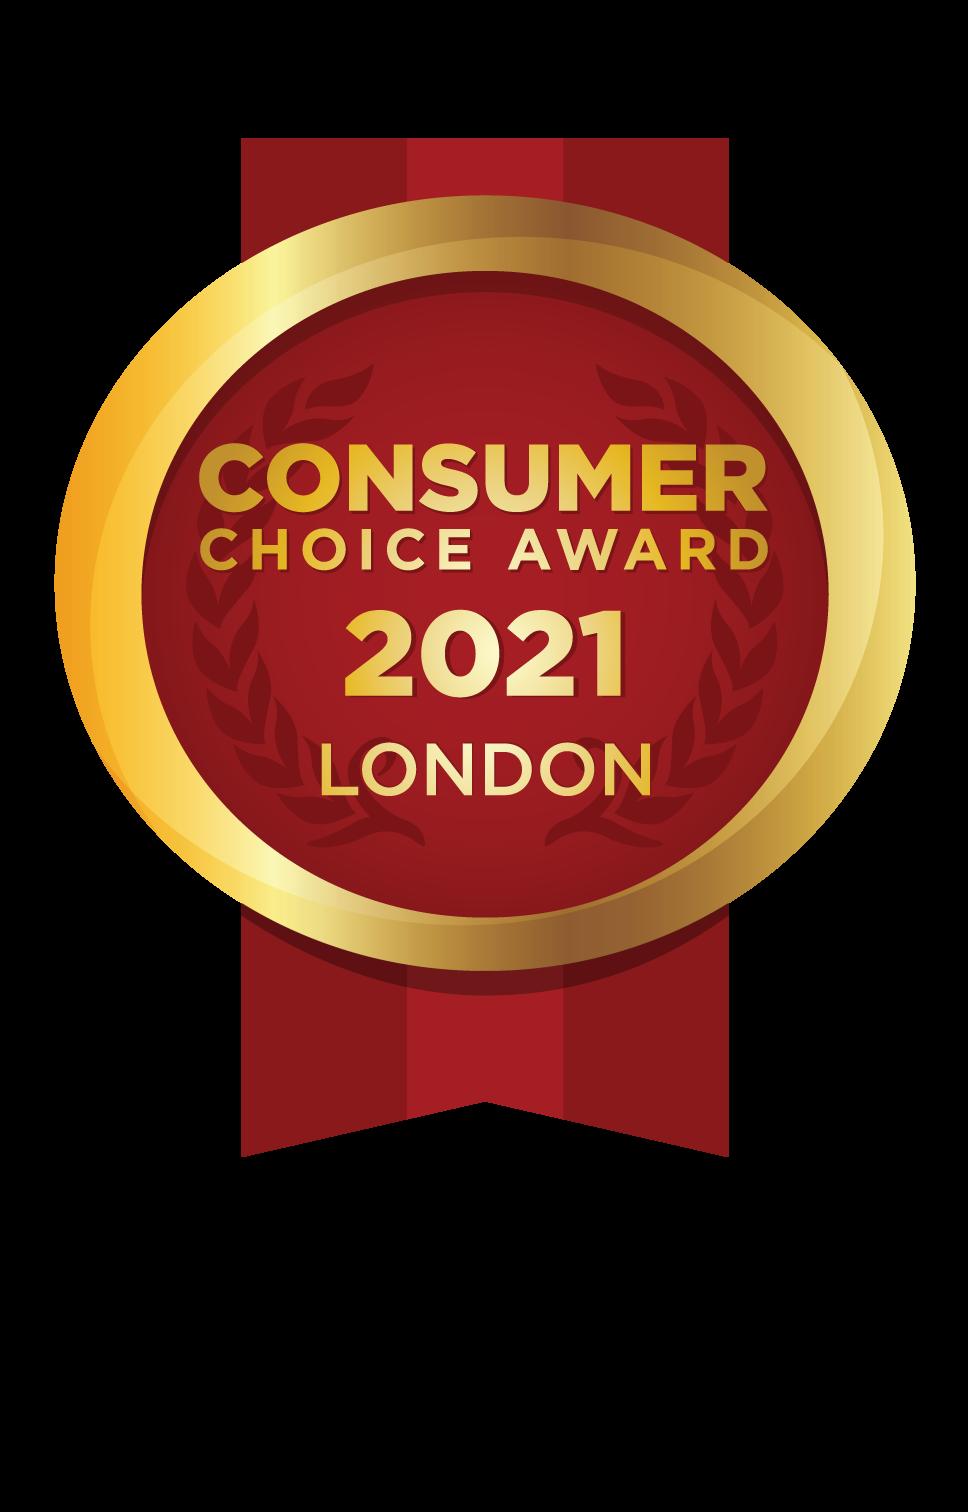 Consumers Choice Award logo